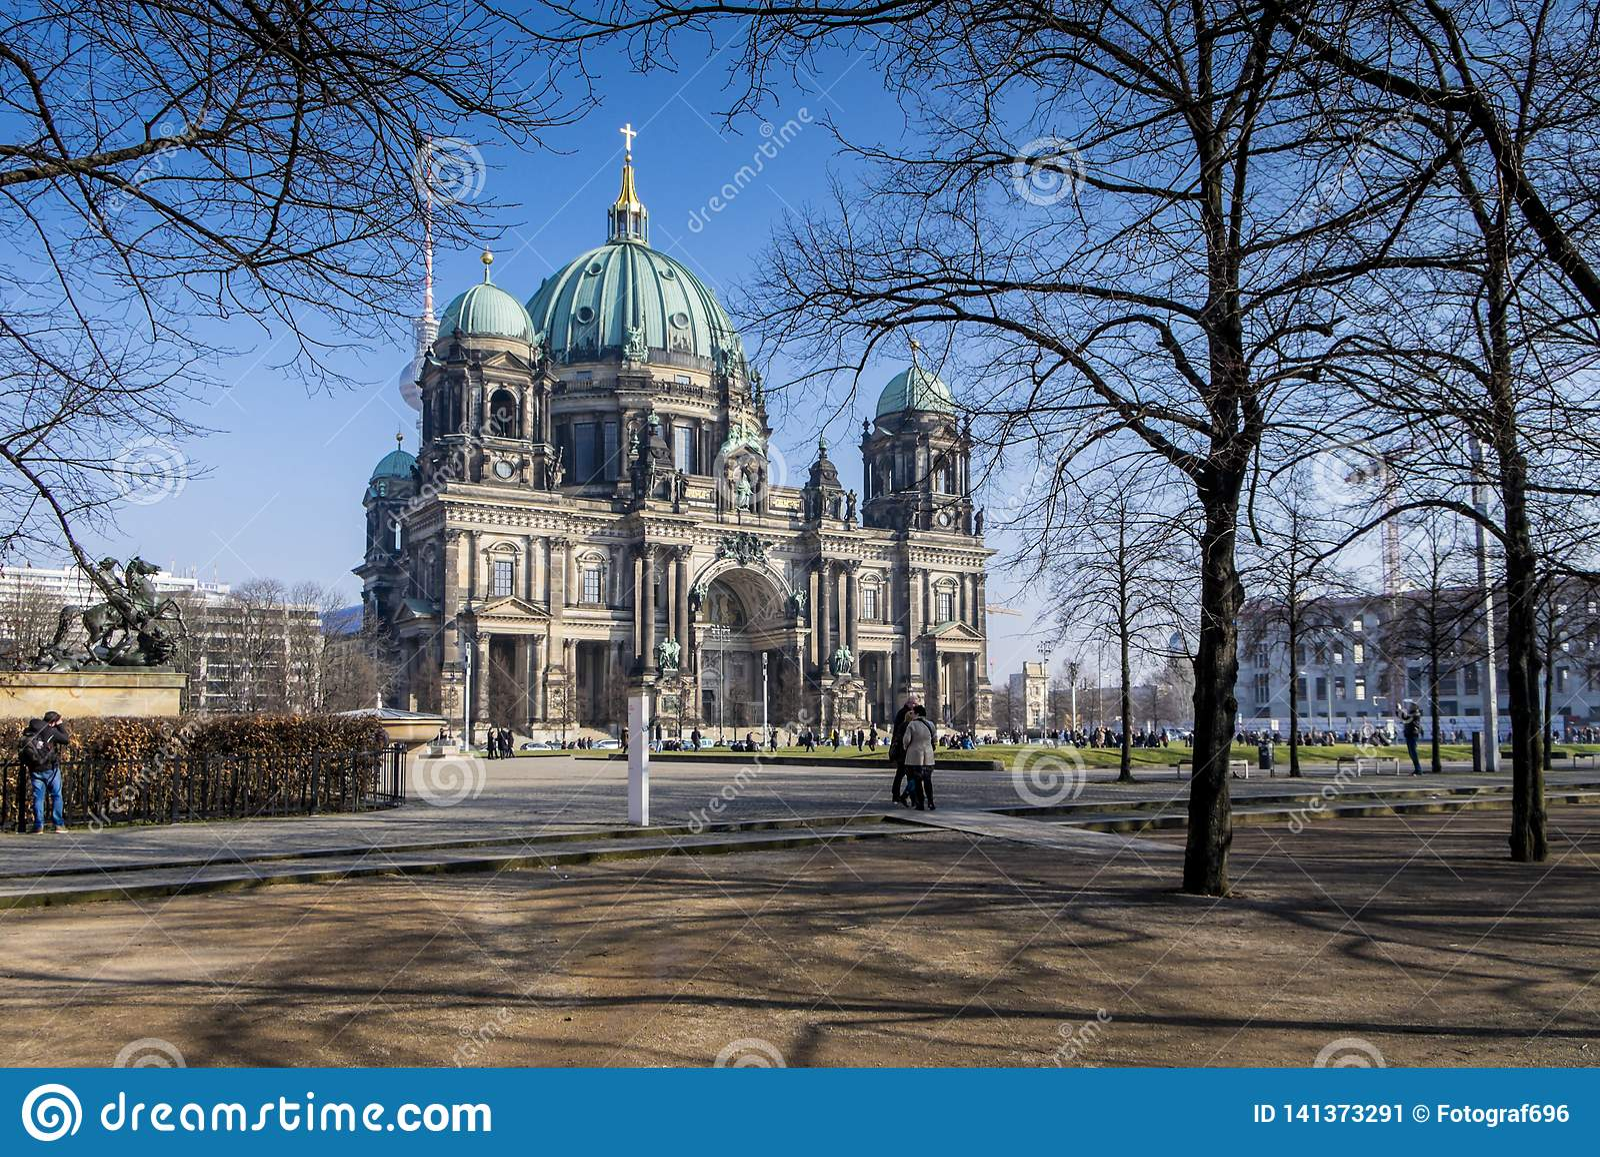 Berlin Cathedral in de winter